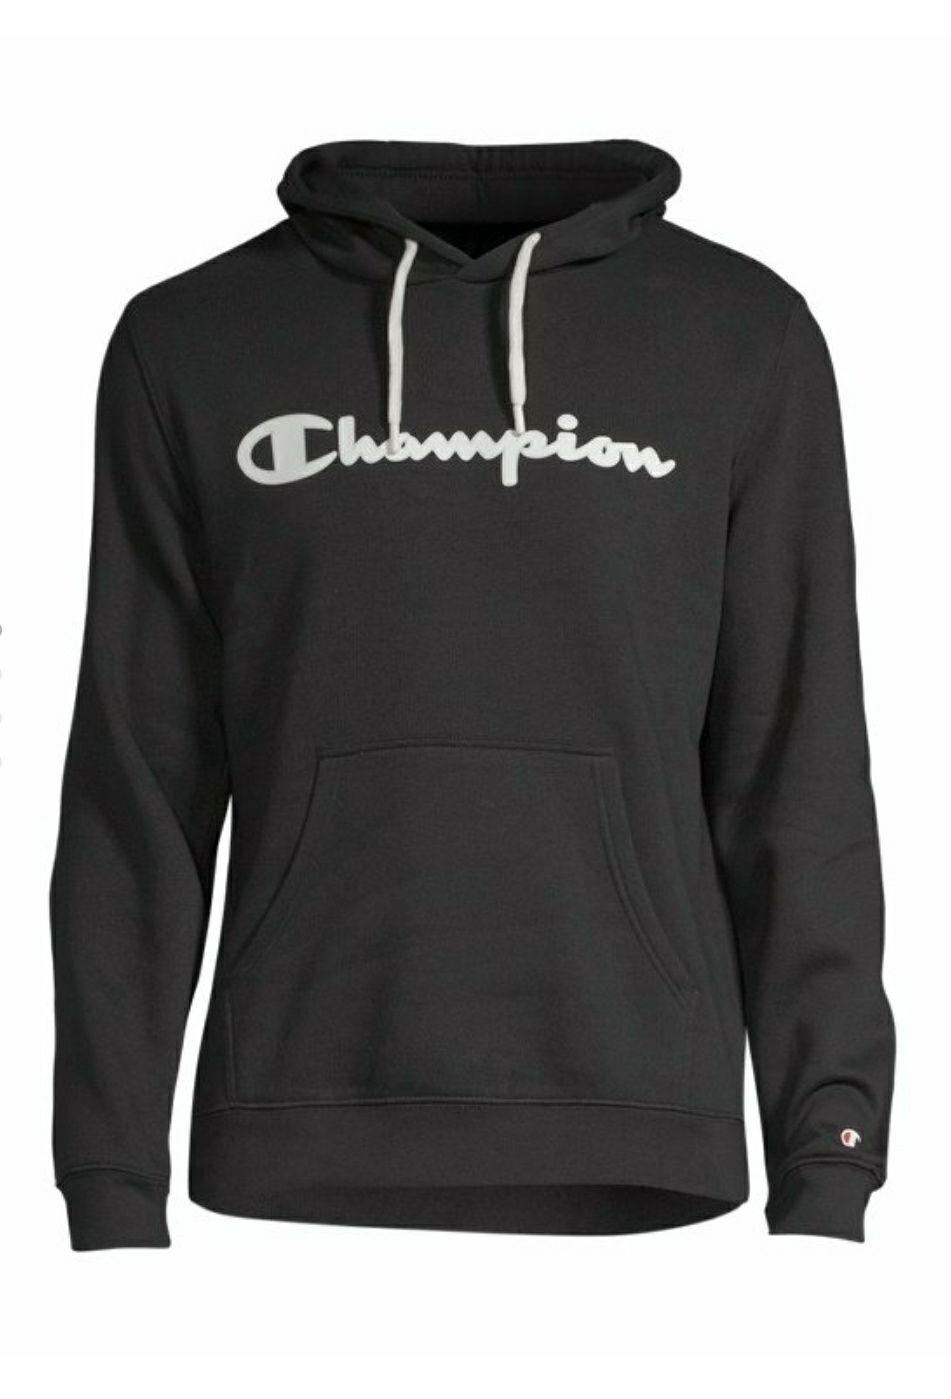 Champions Pullover